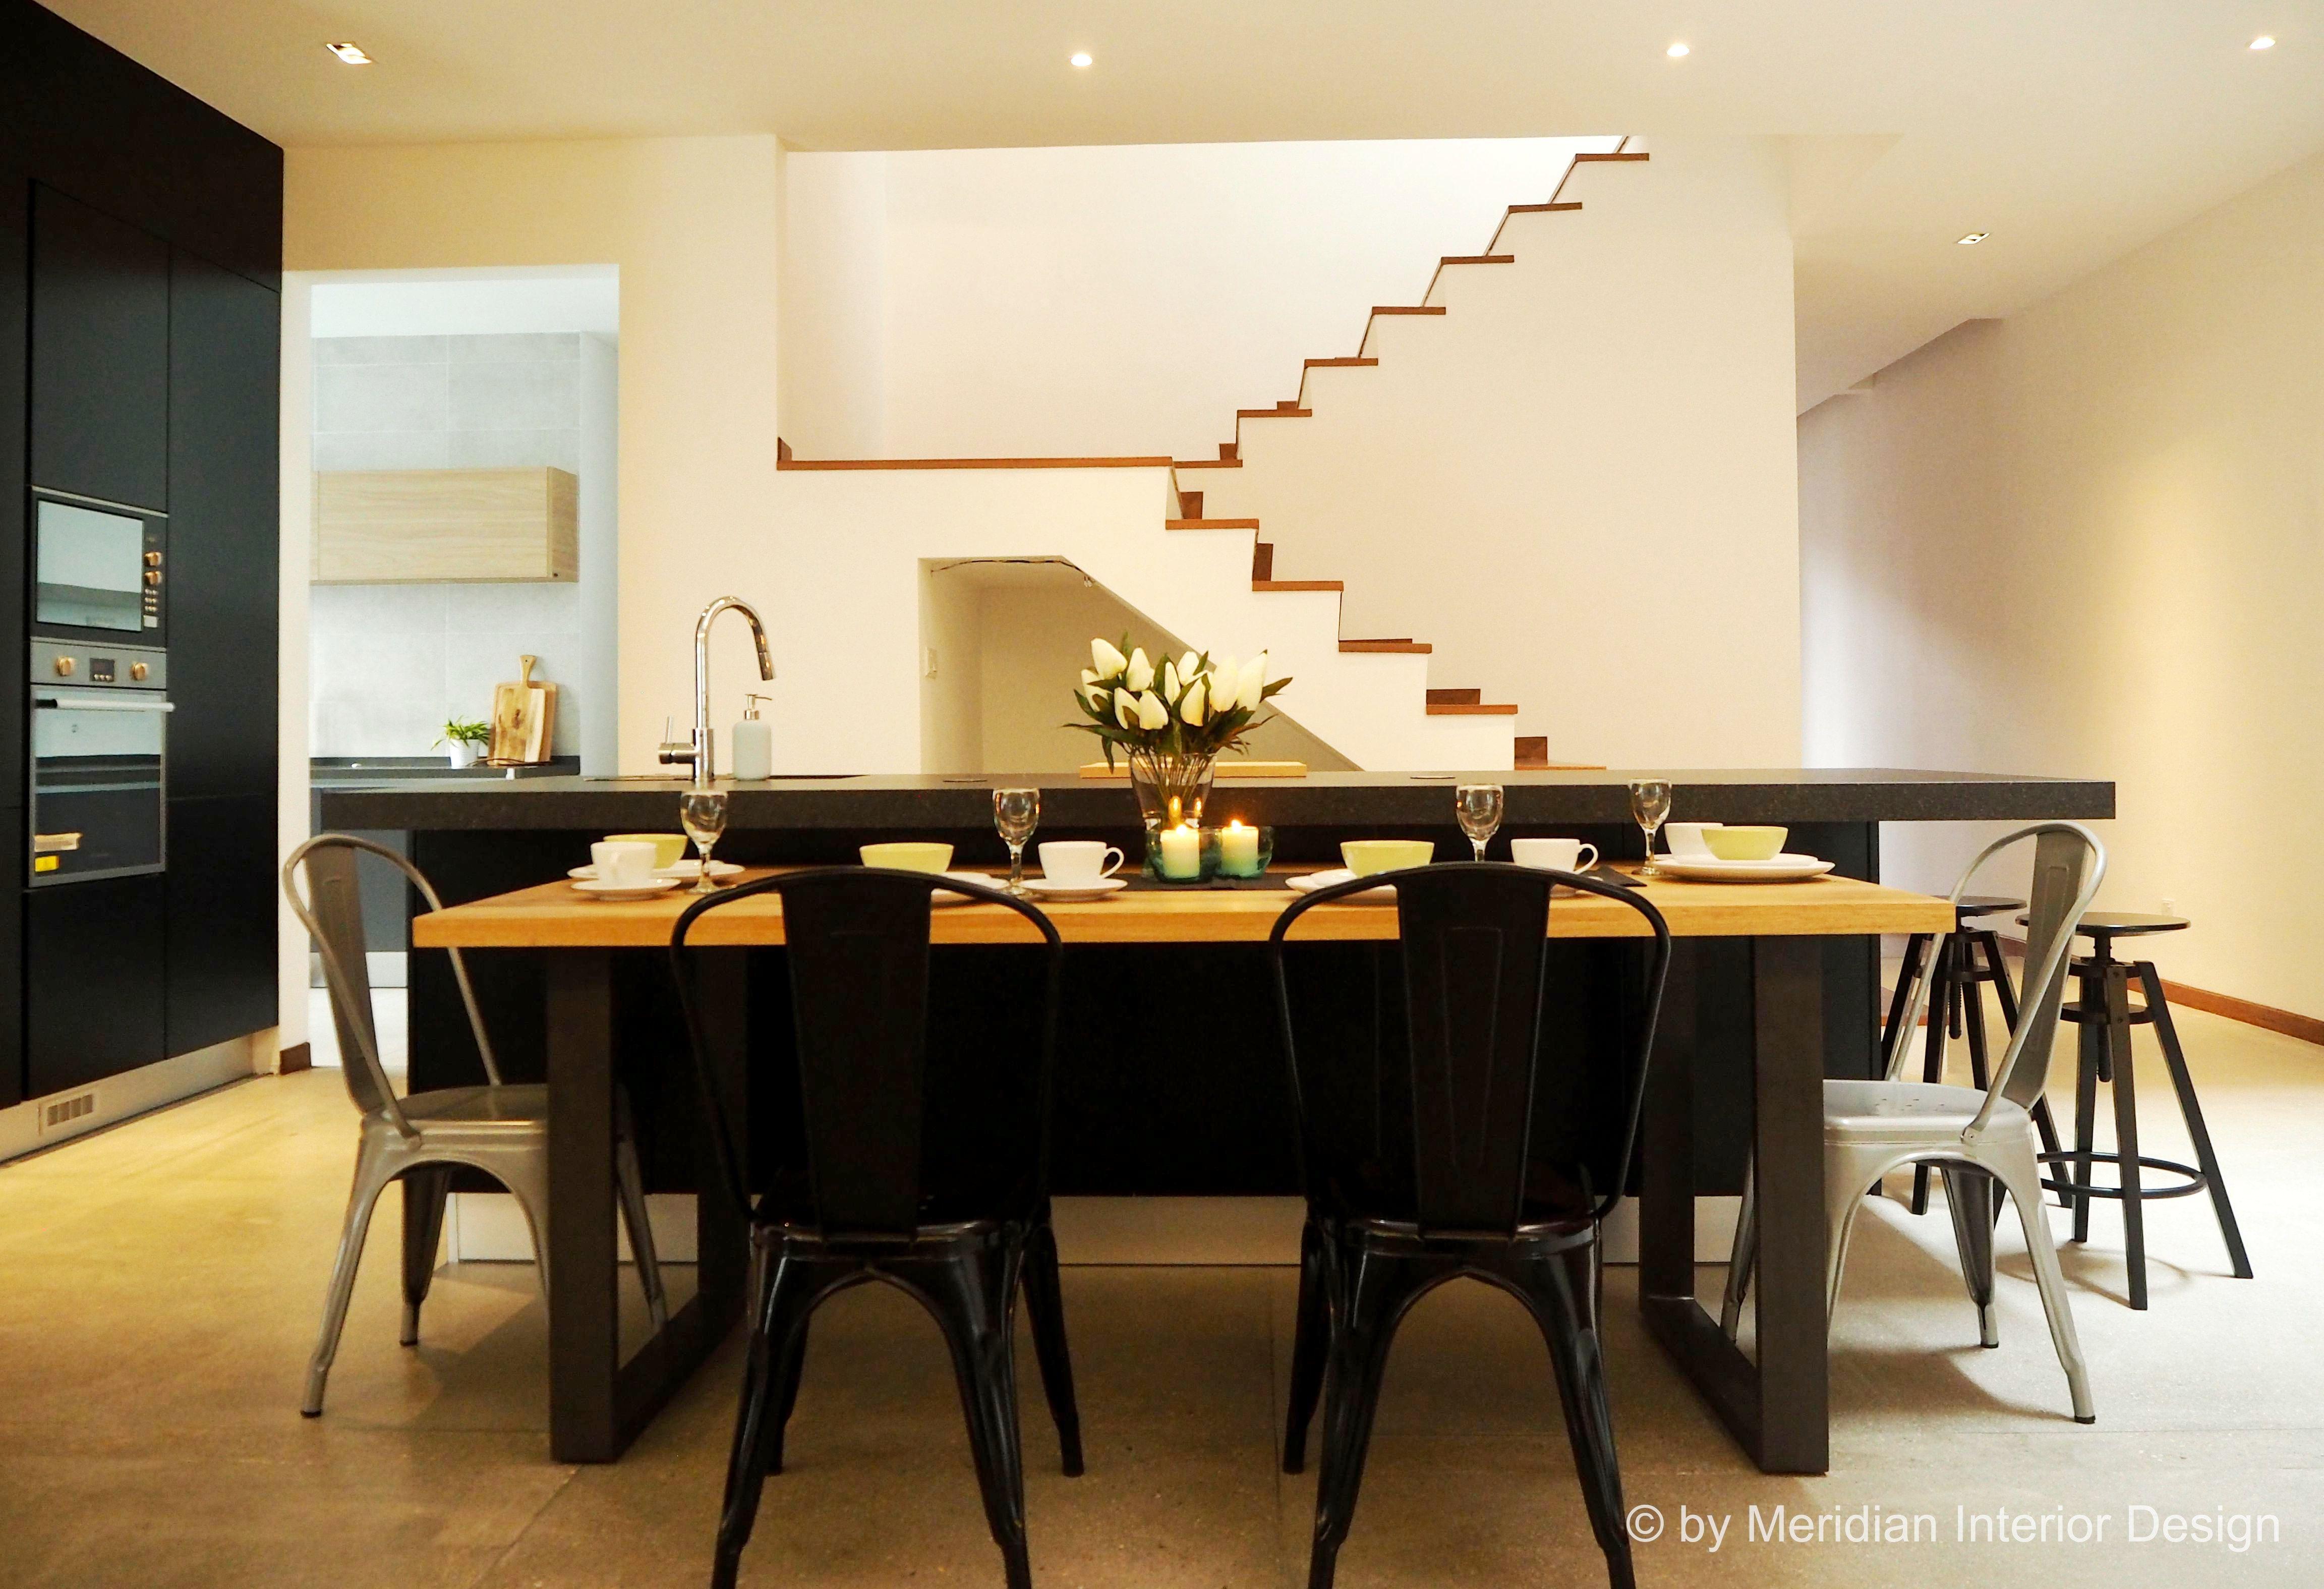 Portfolio Of Home Renovation Interior Design In Malaysia Meridian